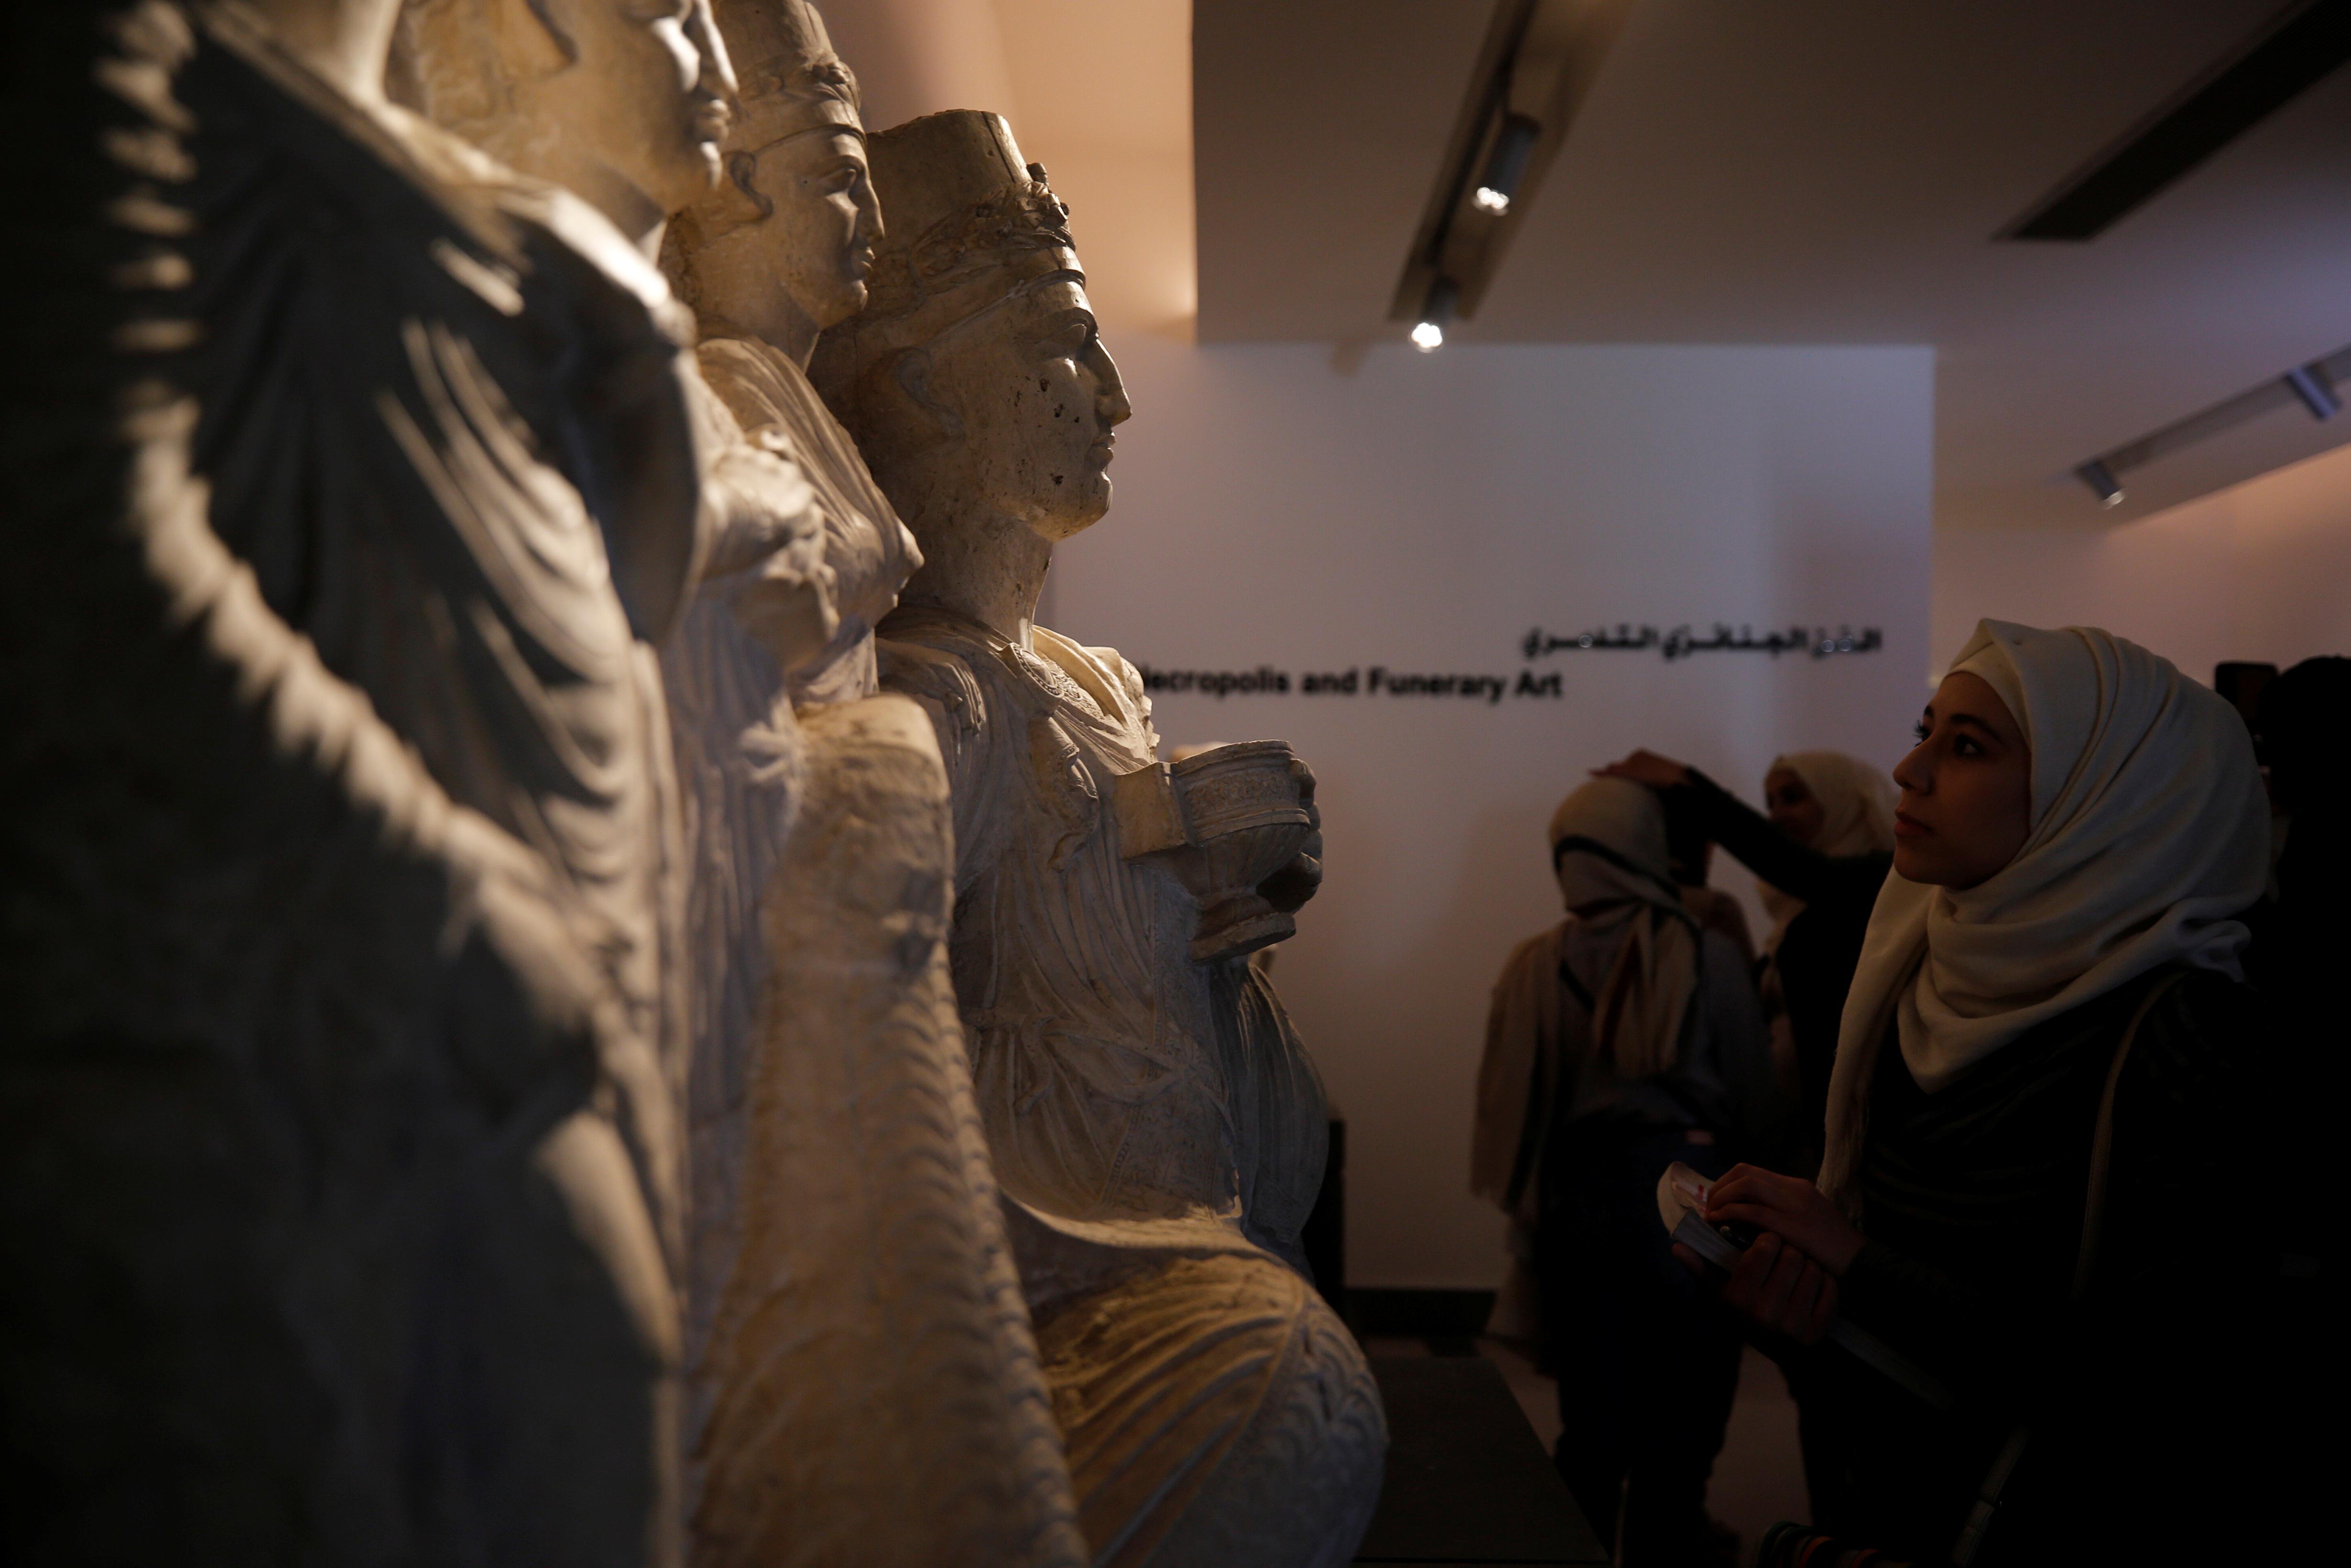 Visitors look sculptures displayed